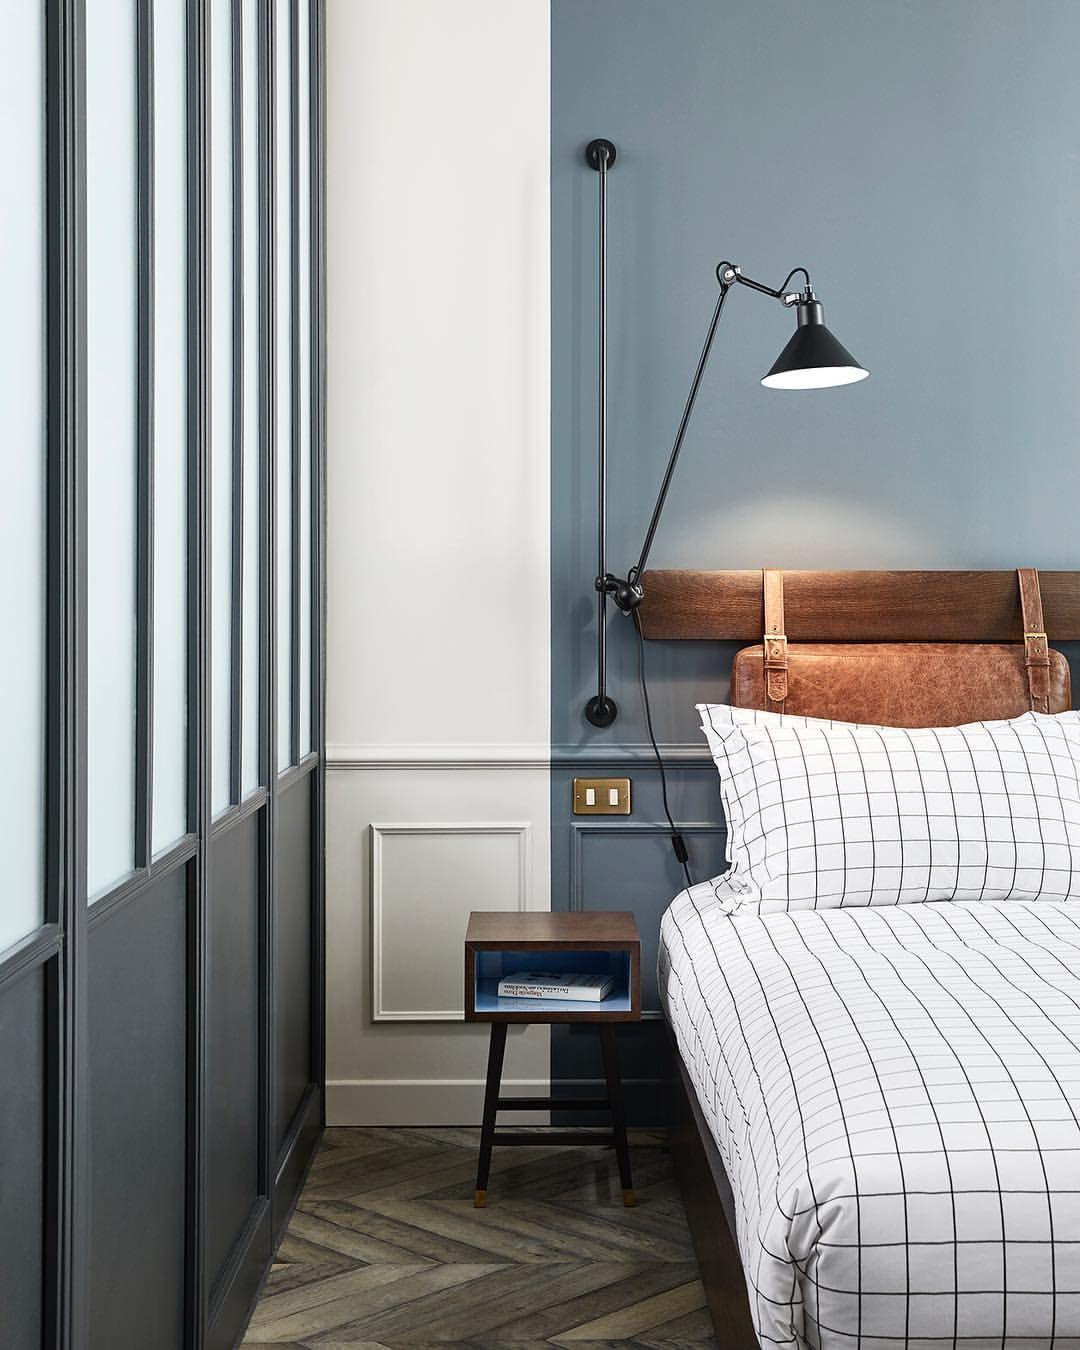 642 mentions j aime 11 commentaires humbert poyet humbertetpoyet sur instagram hoxton. Black Bedroom Furniture Sets. Home Design Ideas